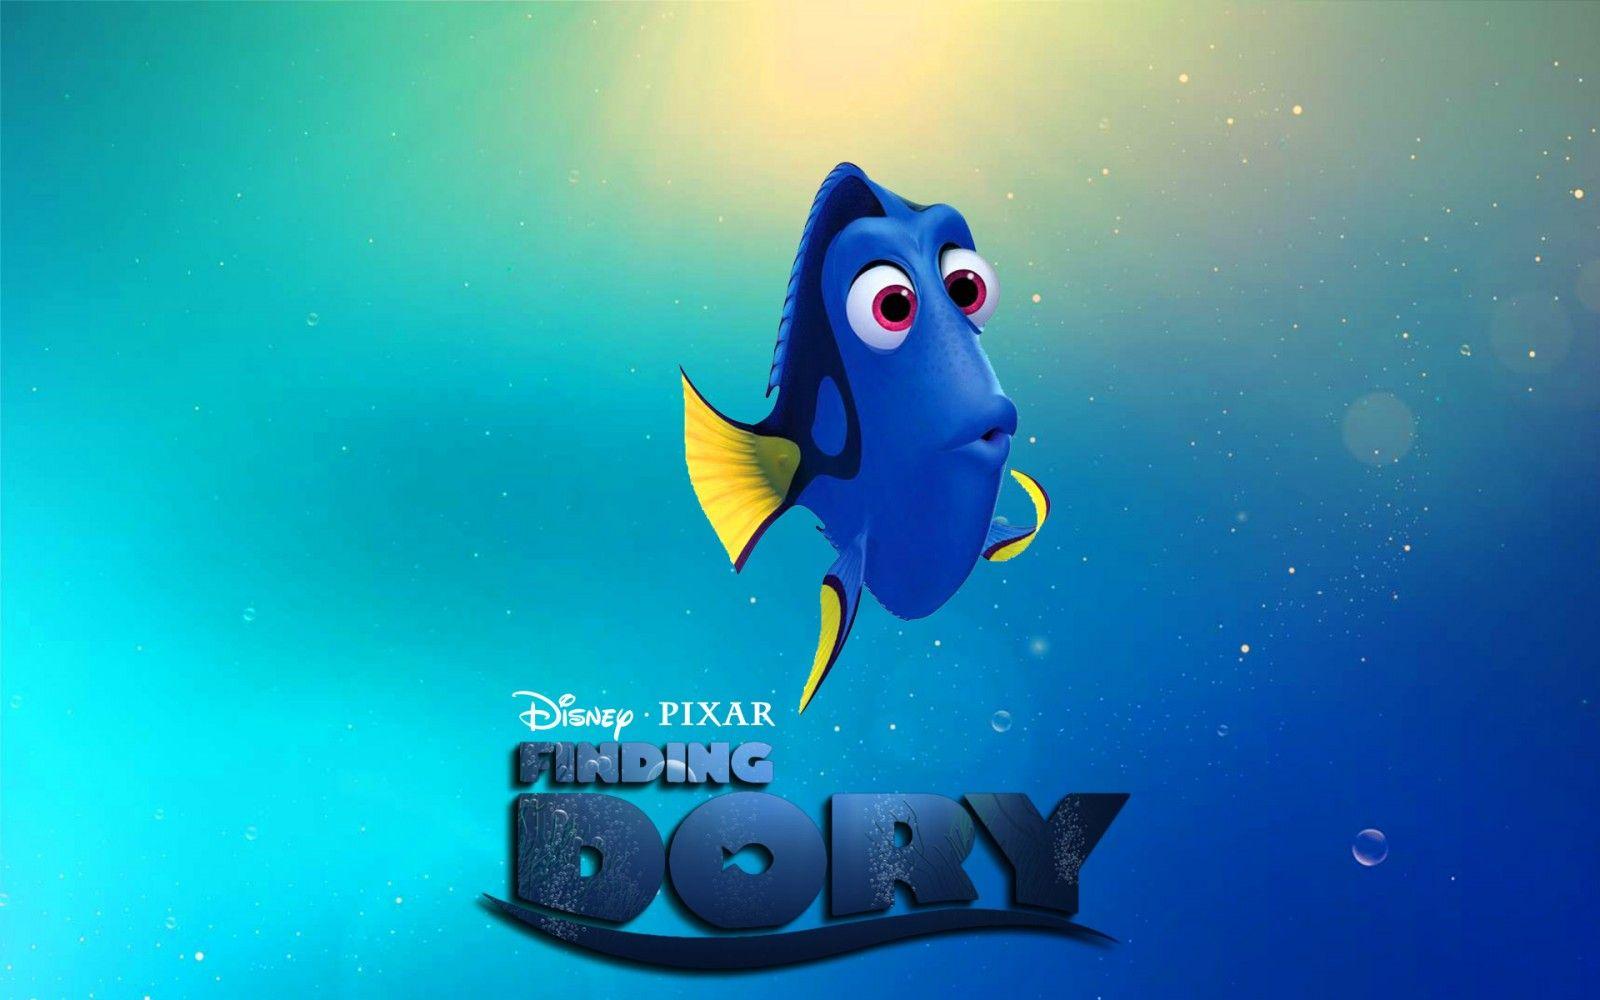 Finding Dory Movie 2016 FanArt Wallpaper